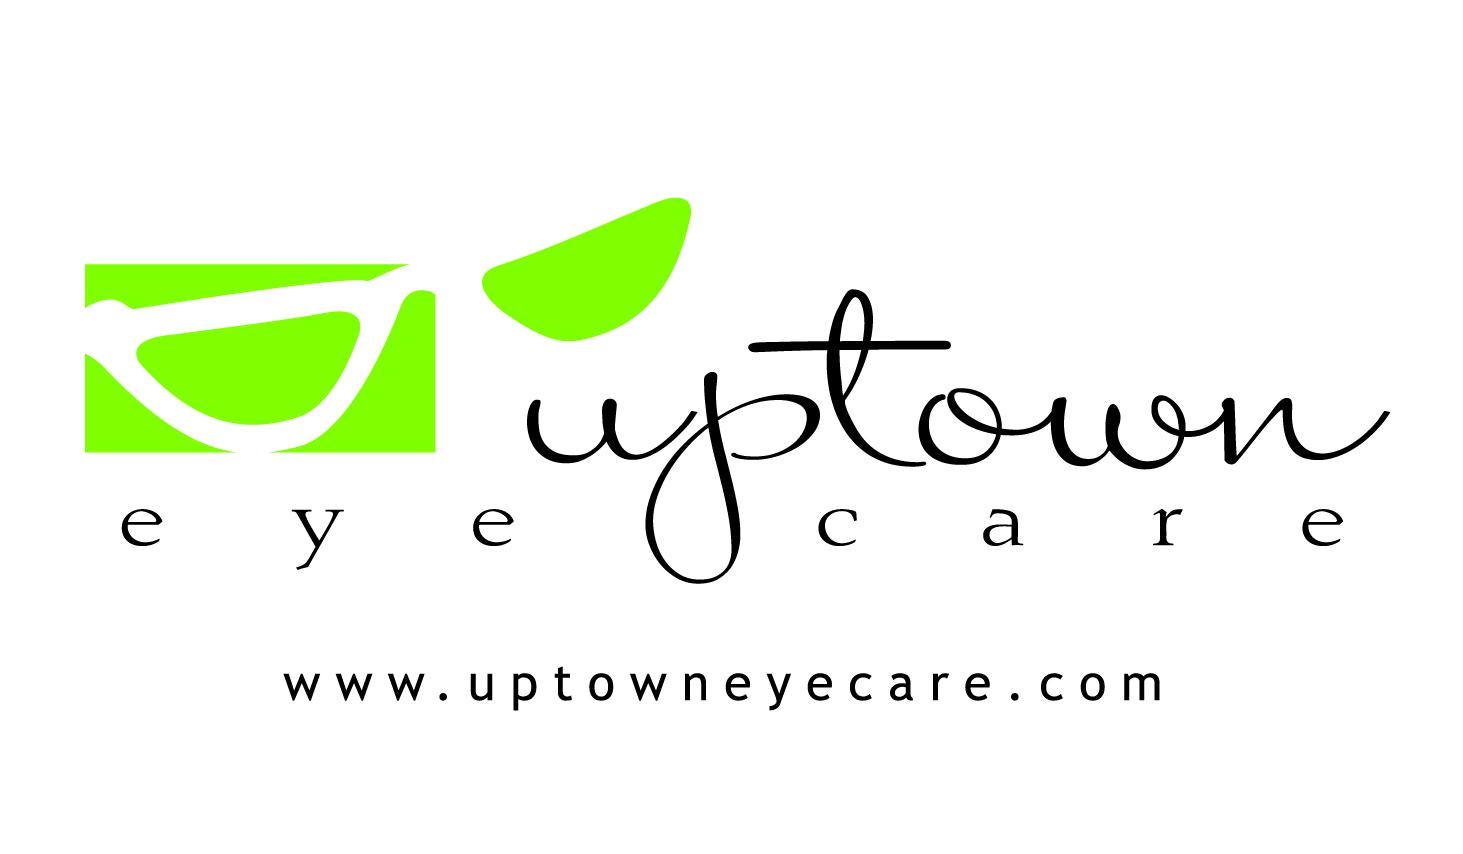 Uptown Eyecare